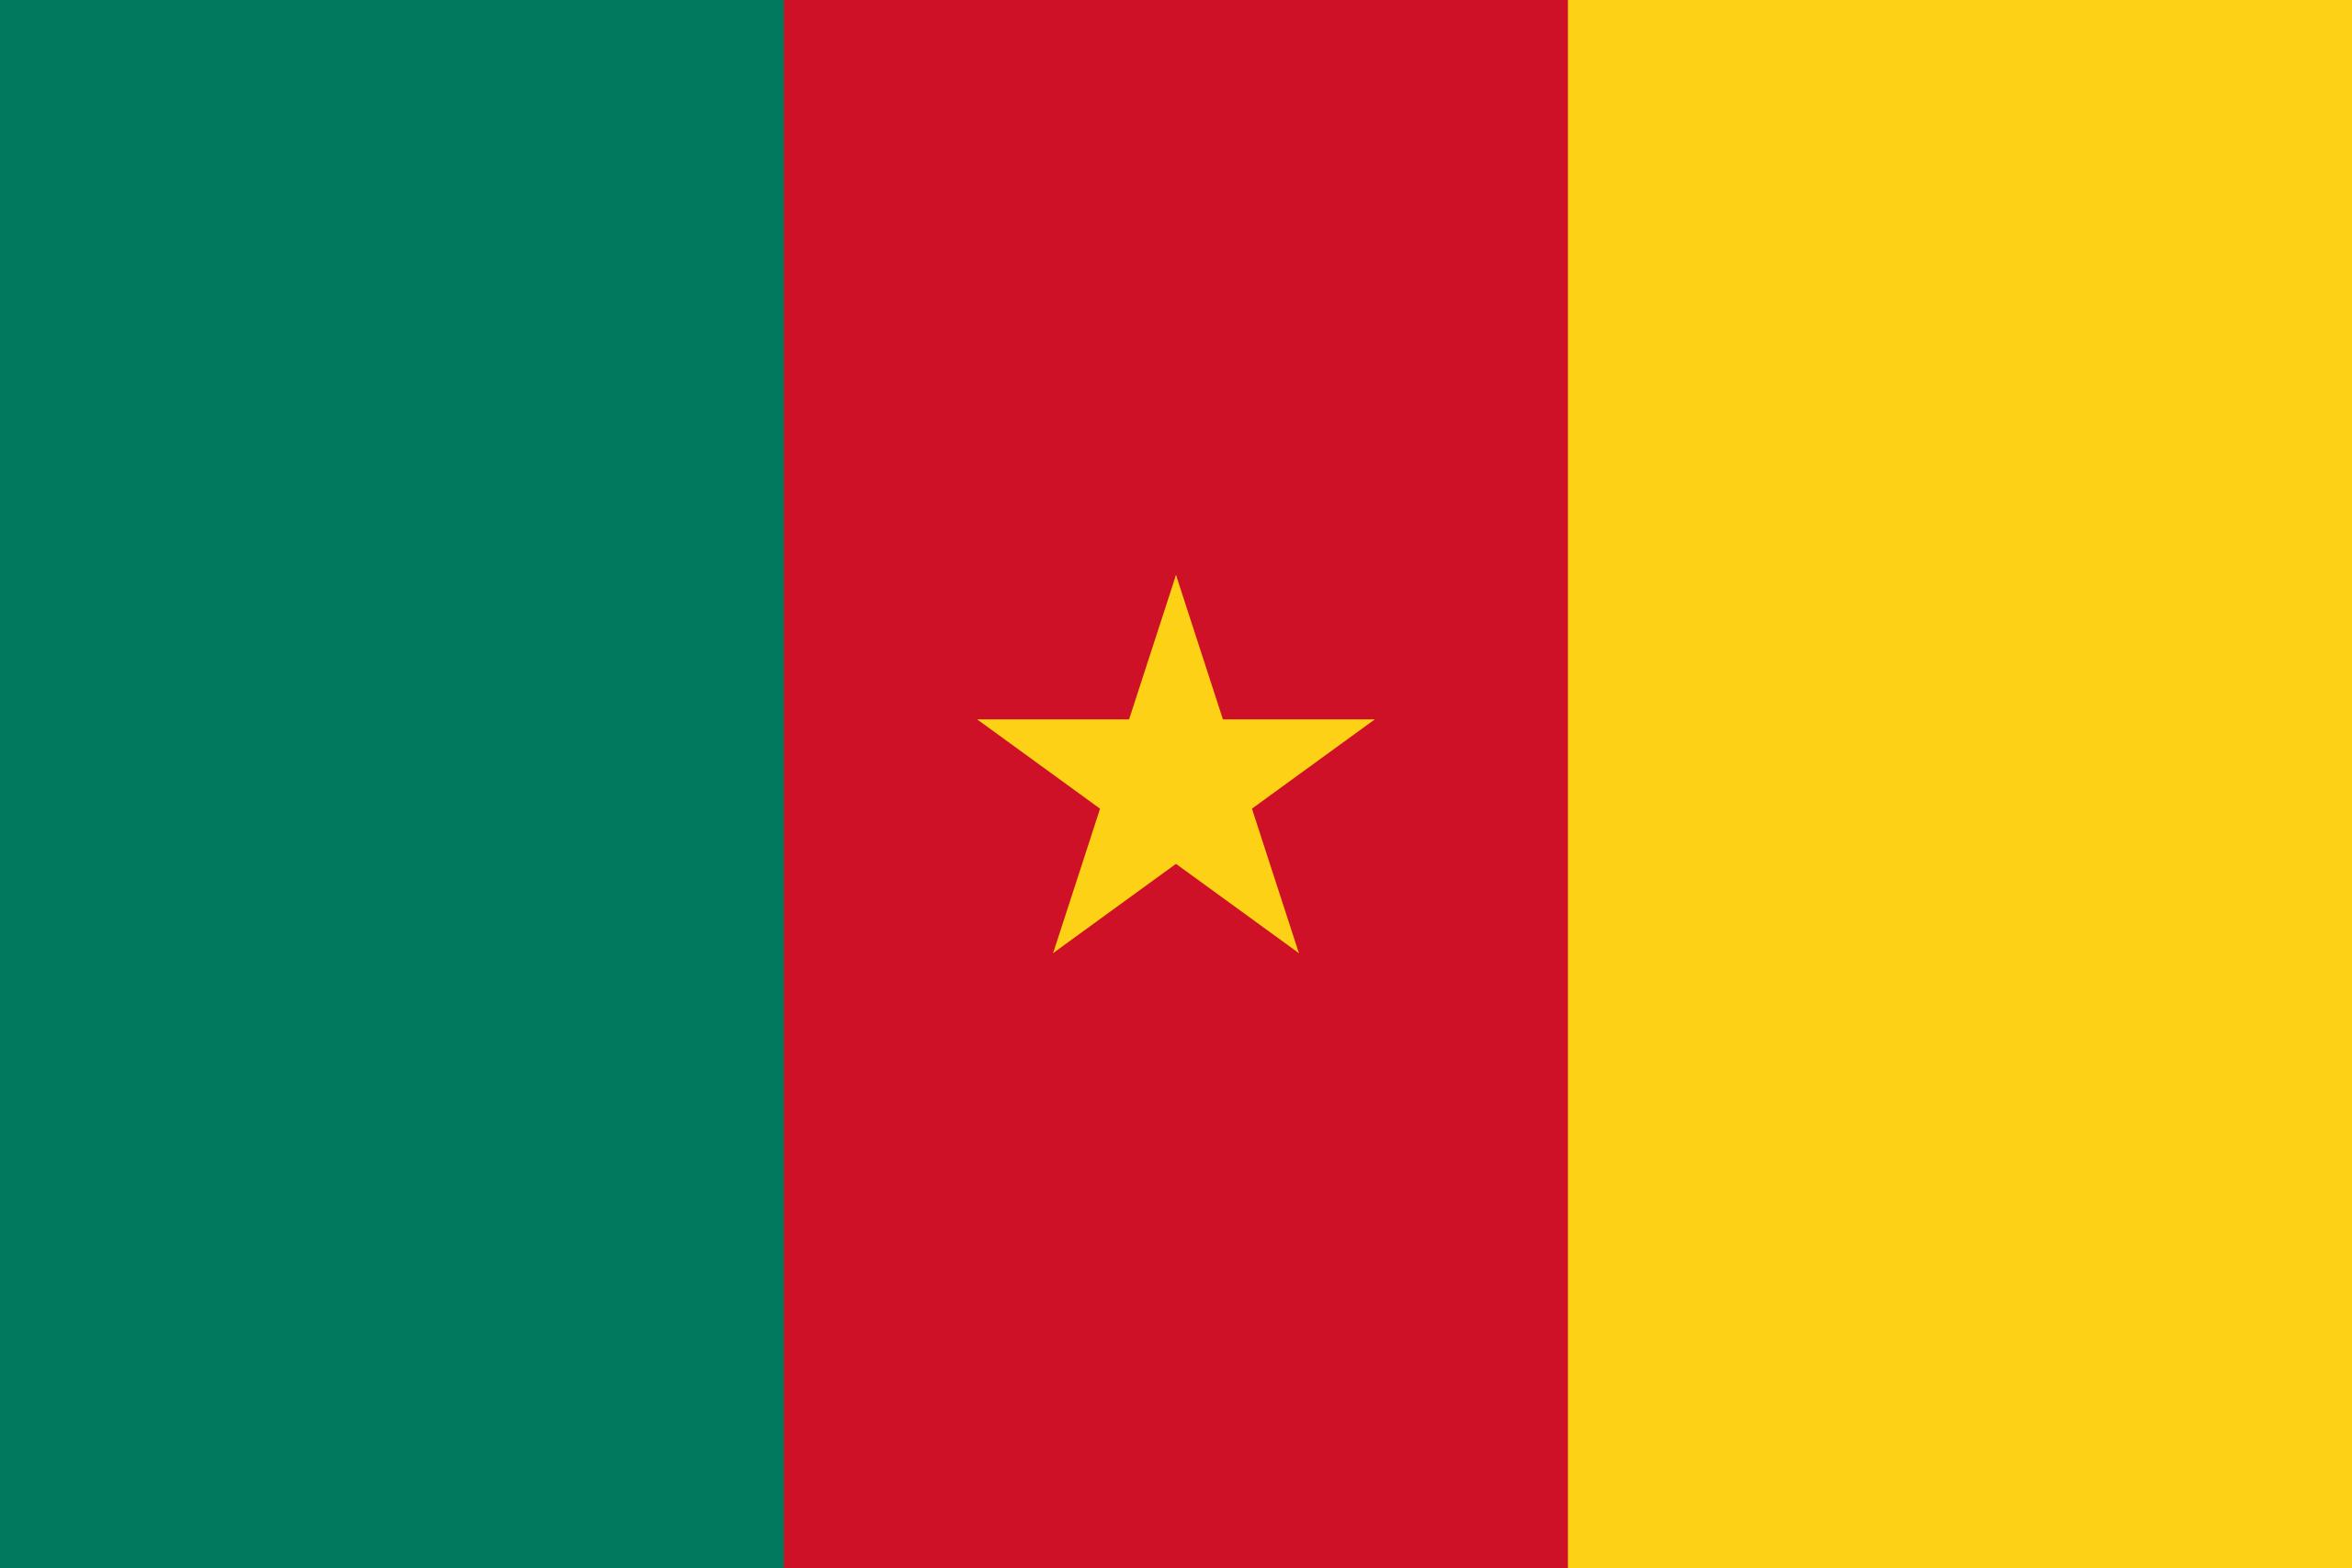 camerún, страна, Эмблема, логотип, символ - Обои HD - Профессор falken.com